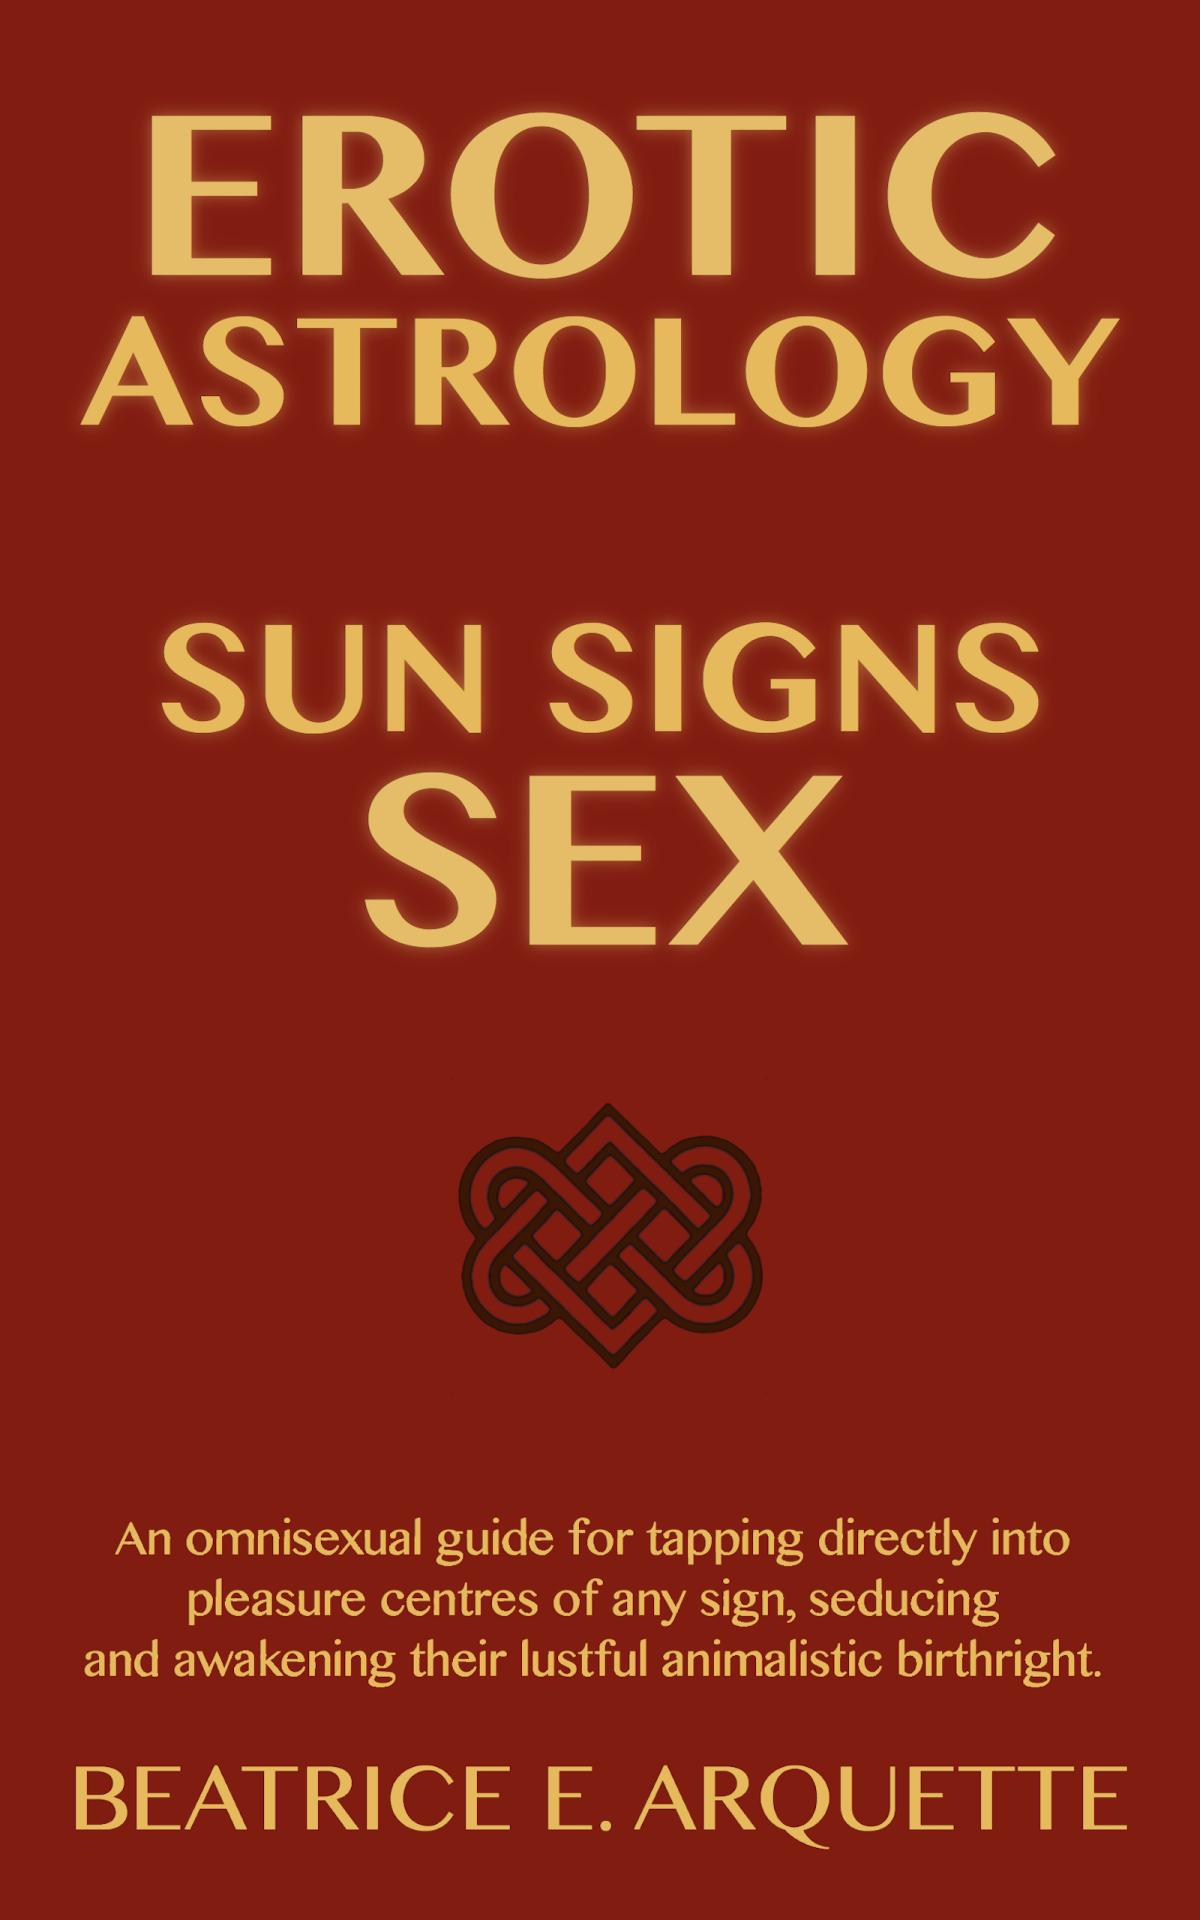 Sex sign sun